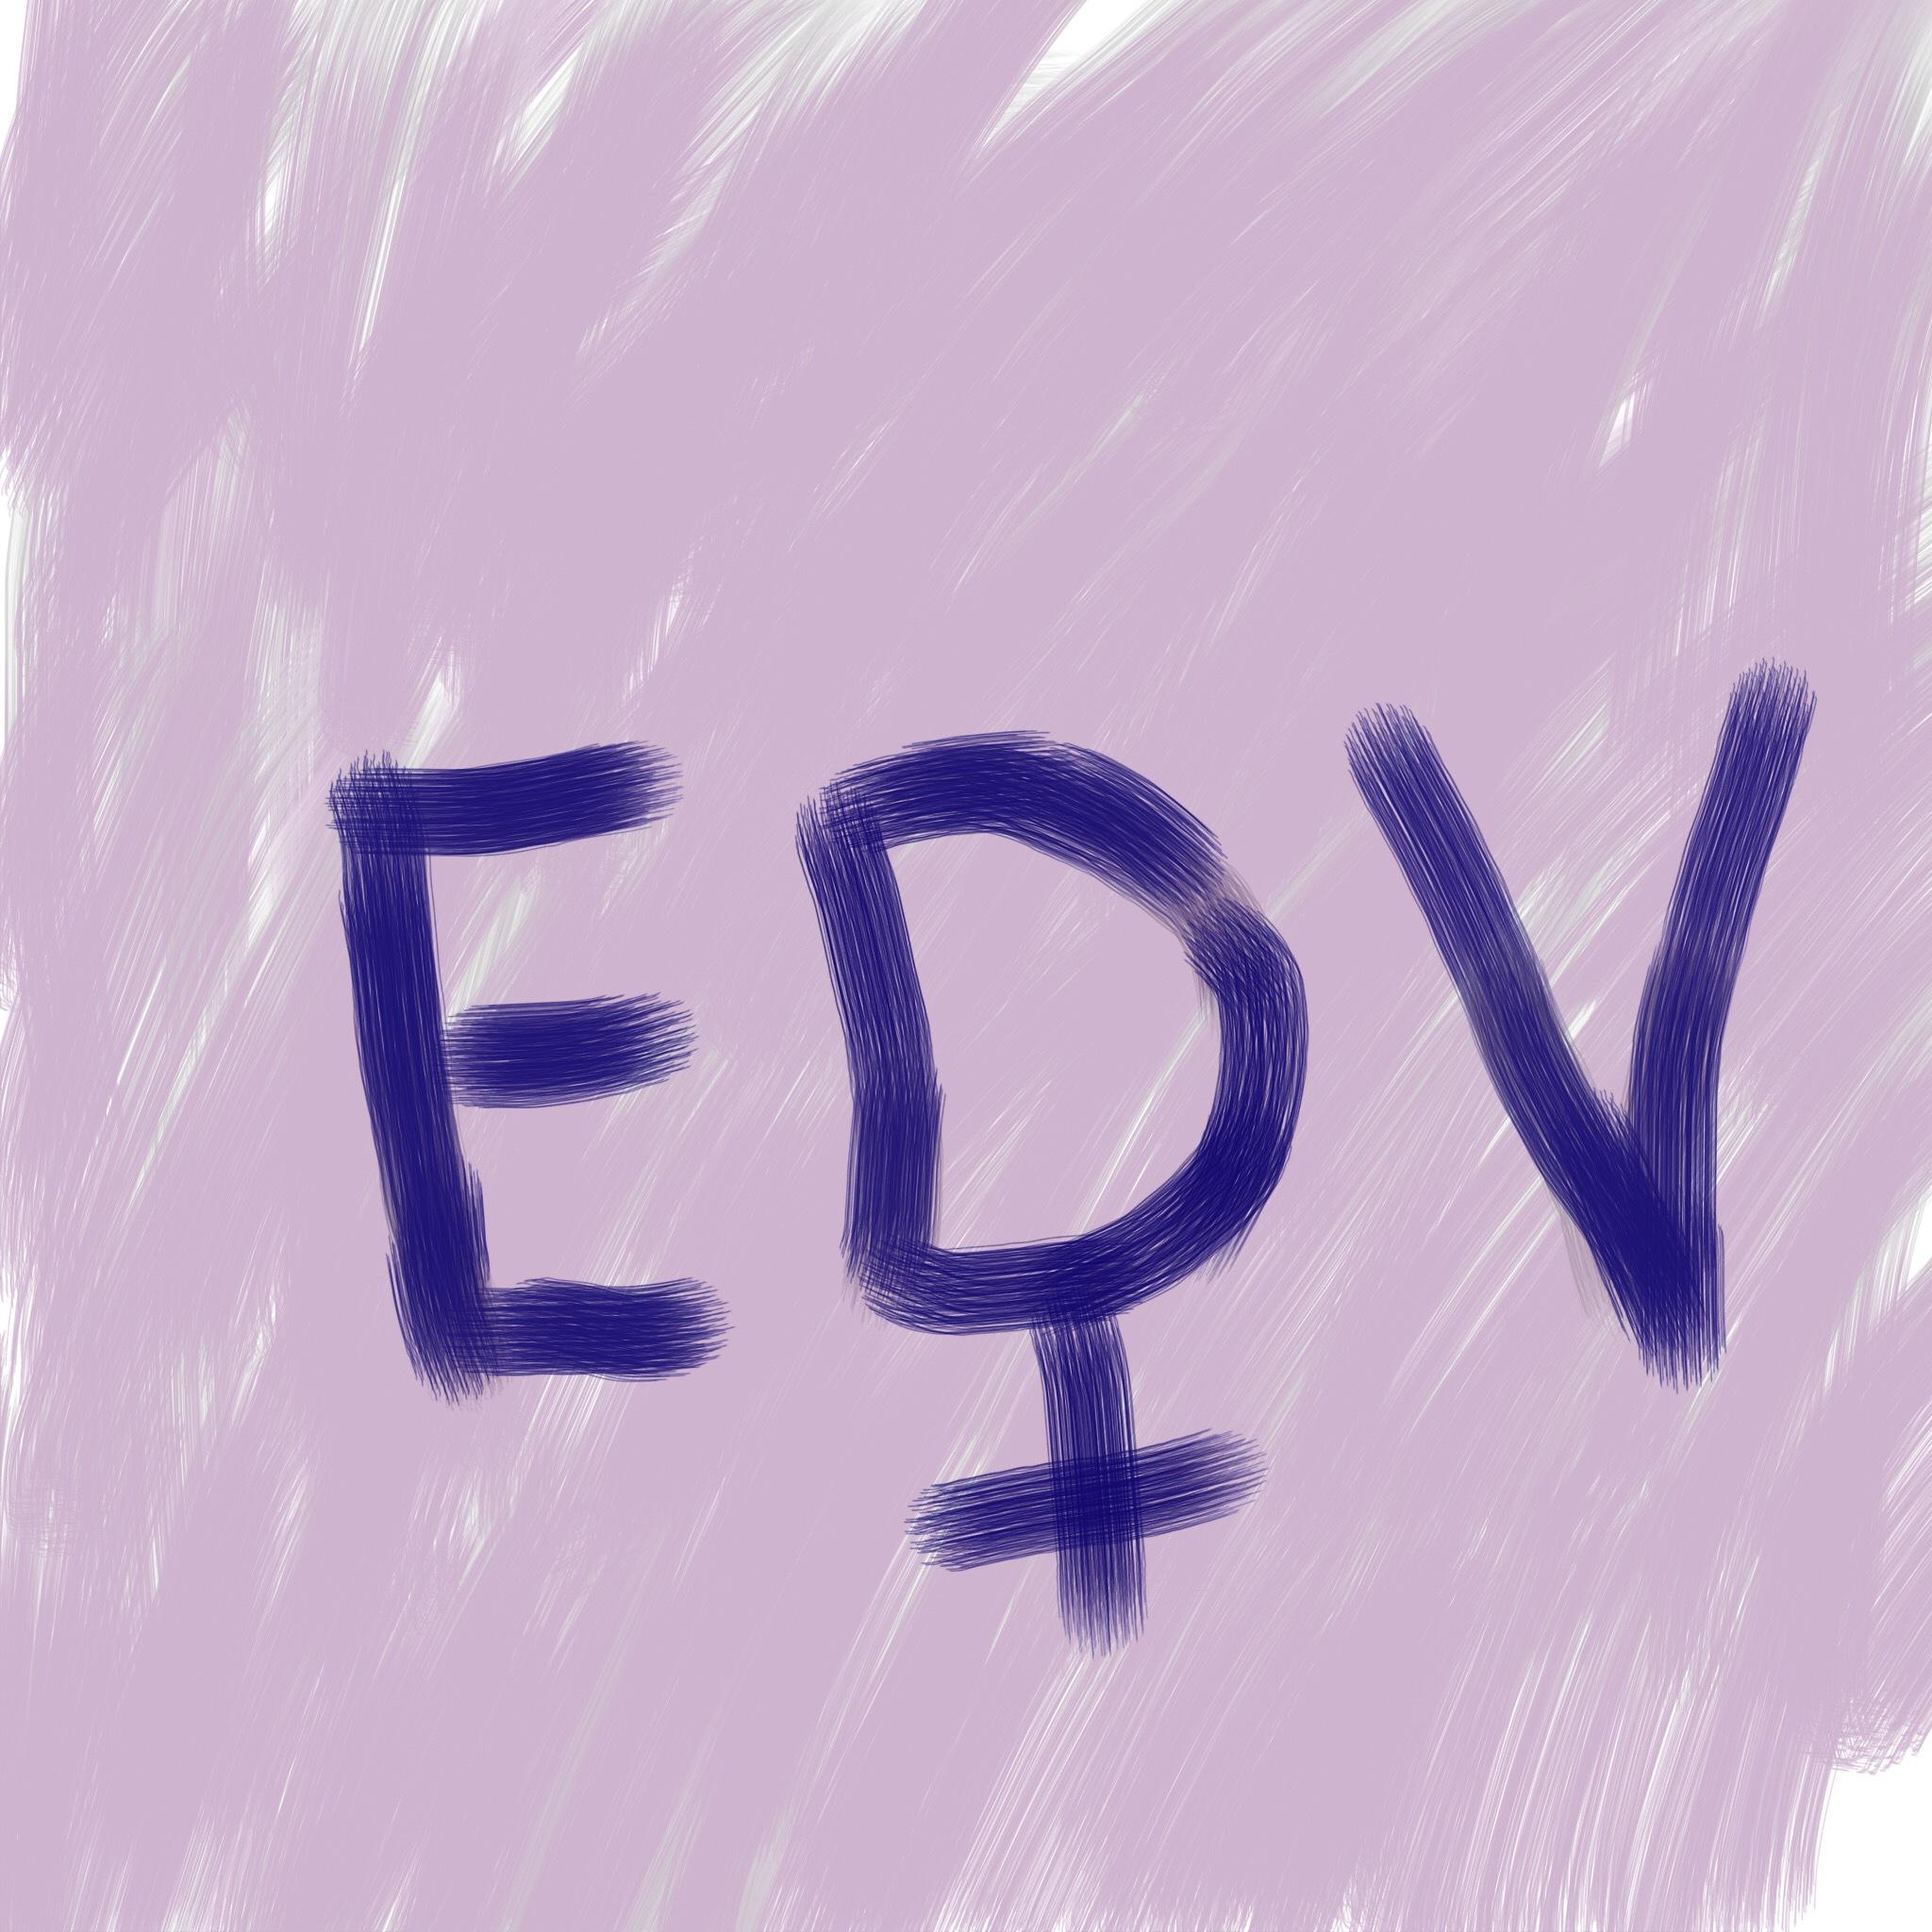 EDV - von Frau zu Frau